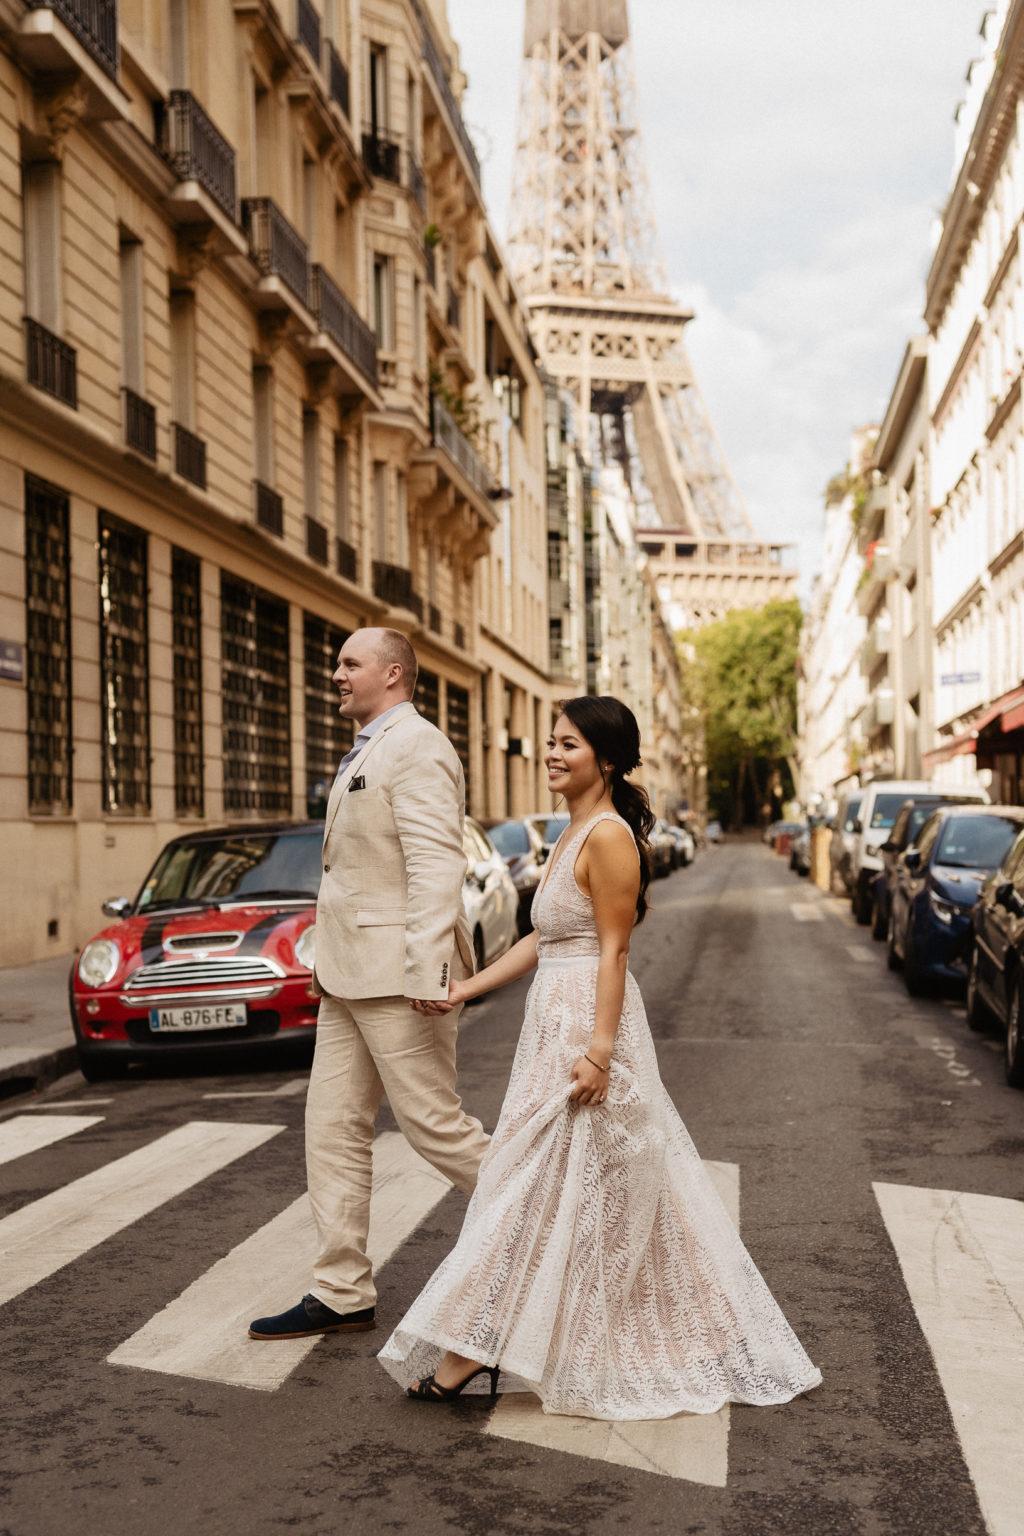 No stress Paris Elopement with Eiffel tower